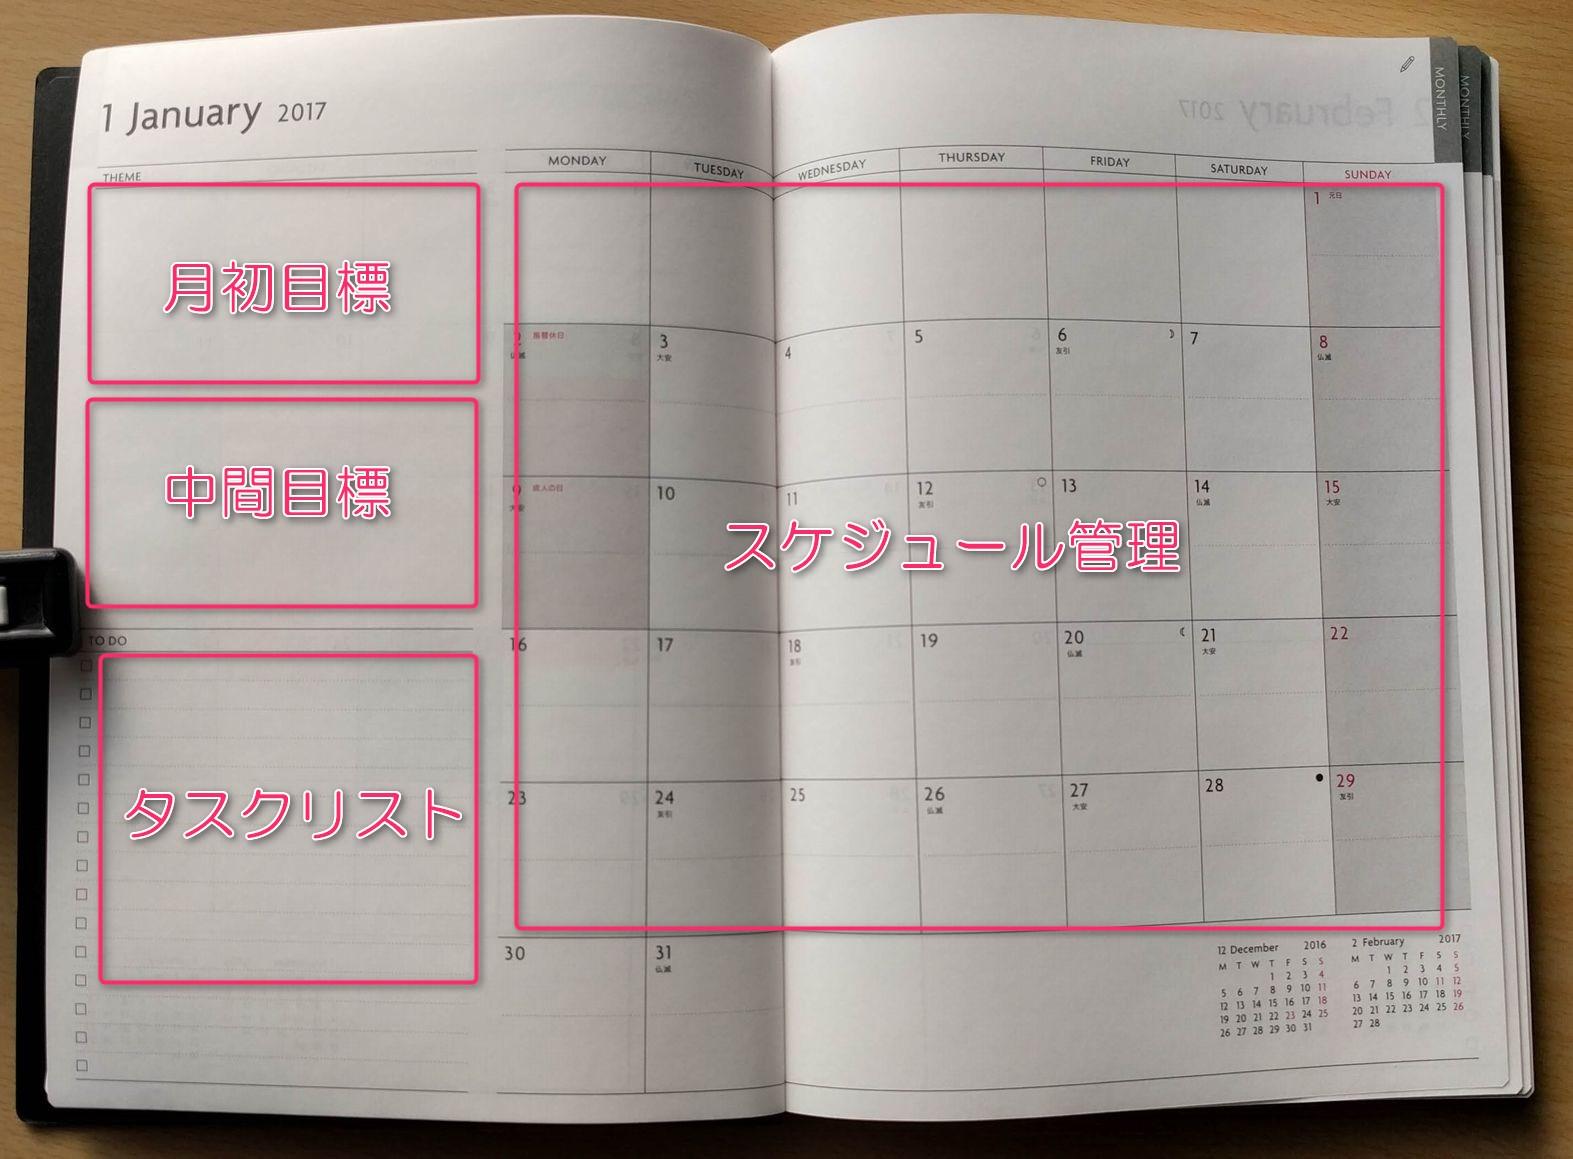 EDiT 週間ノート 月間カレンダー